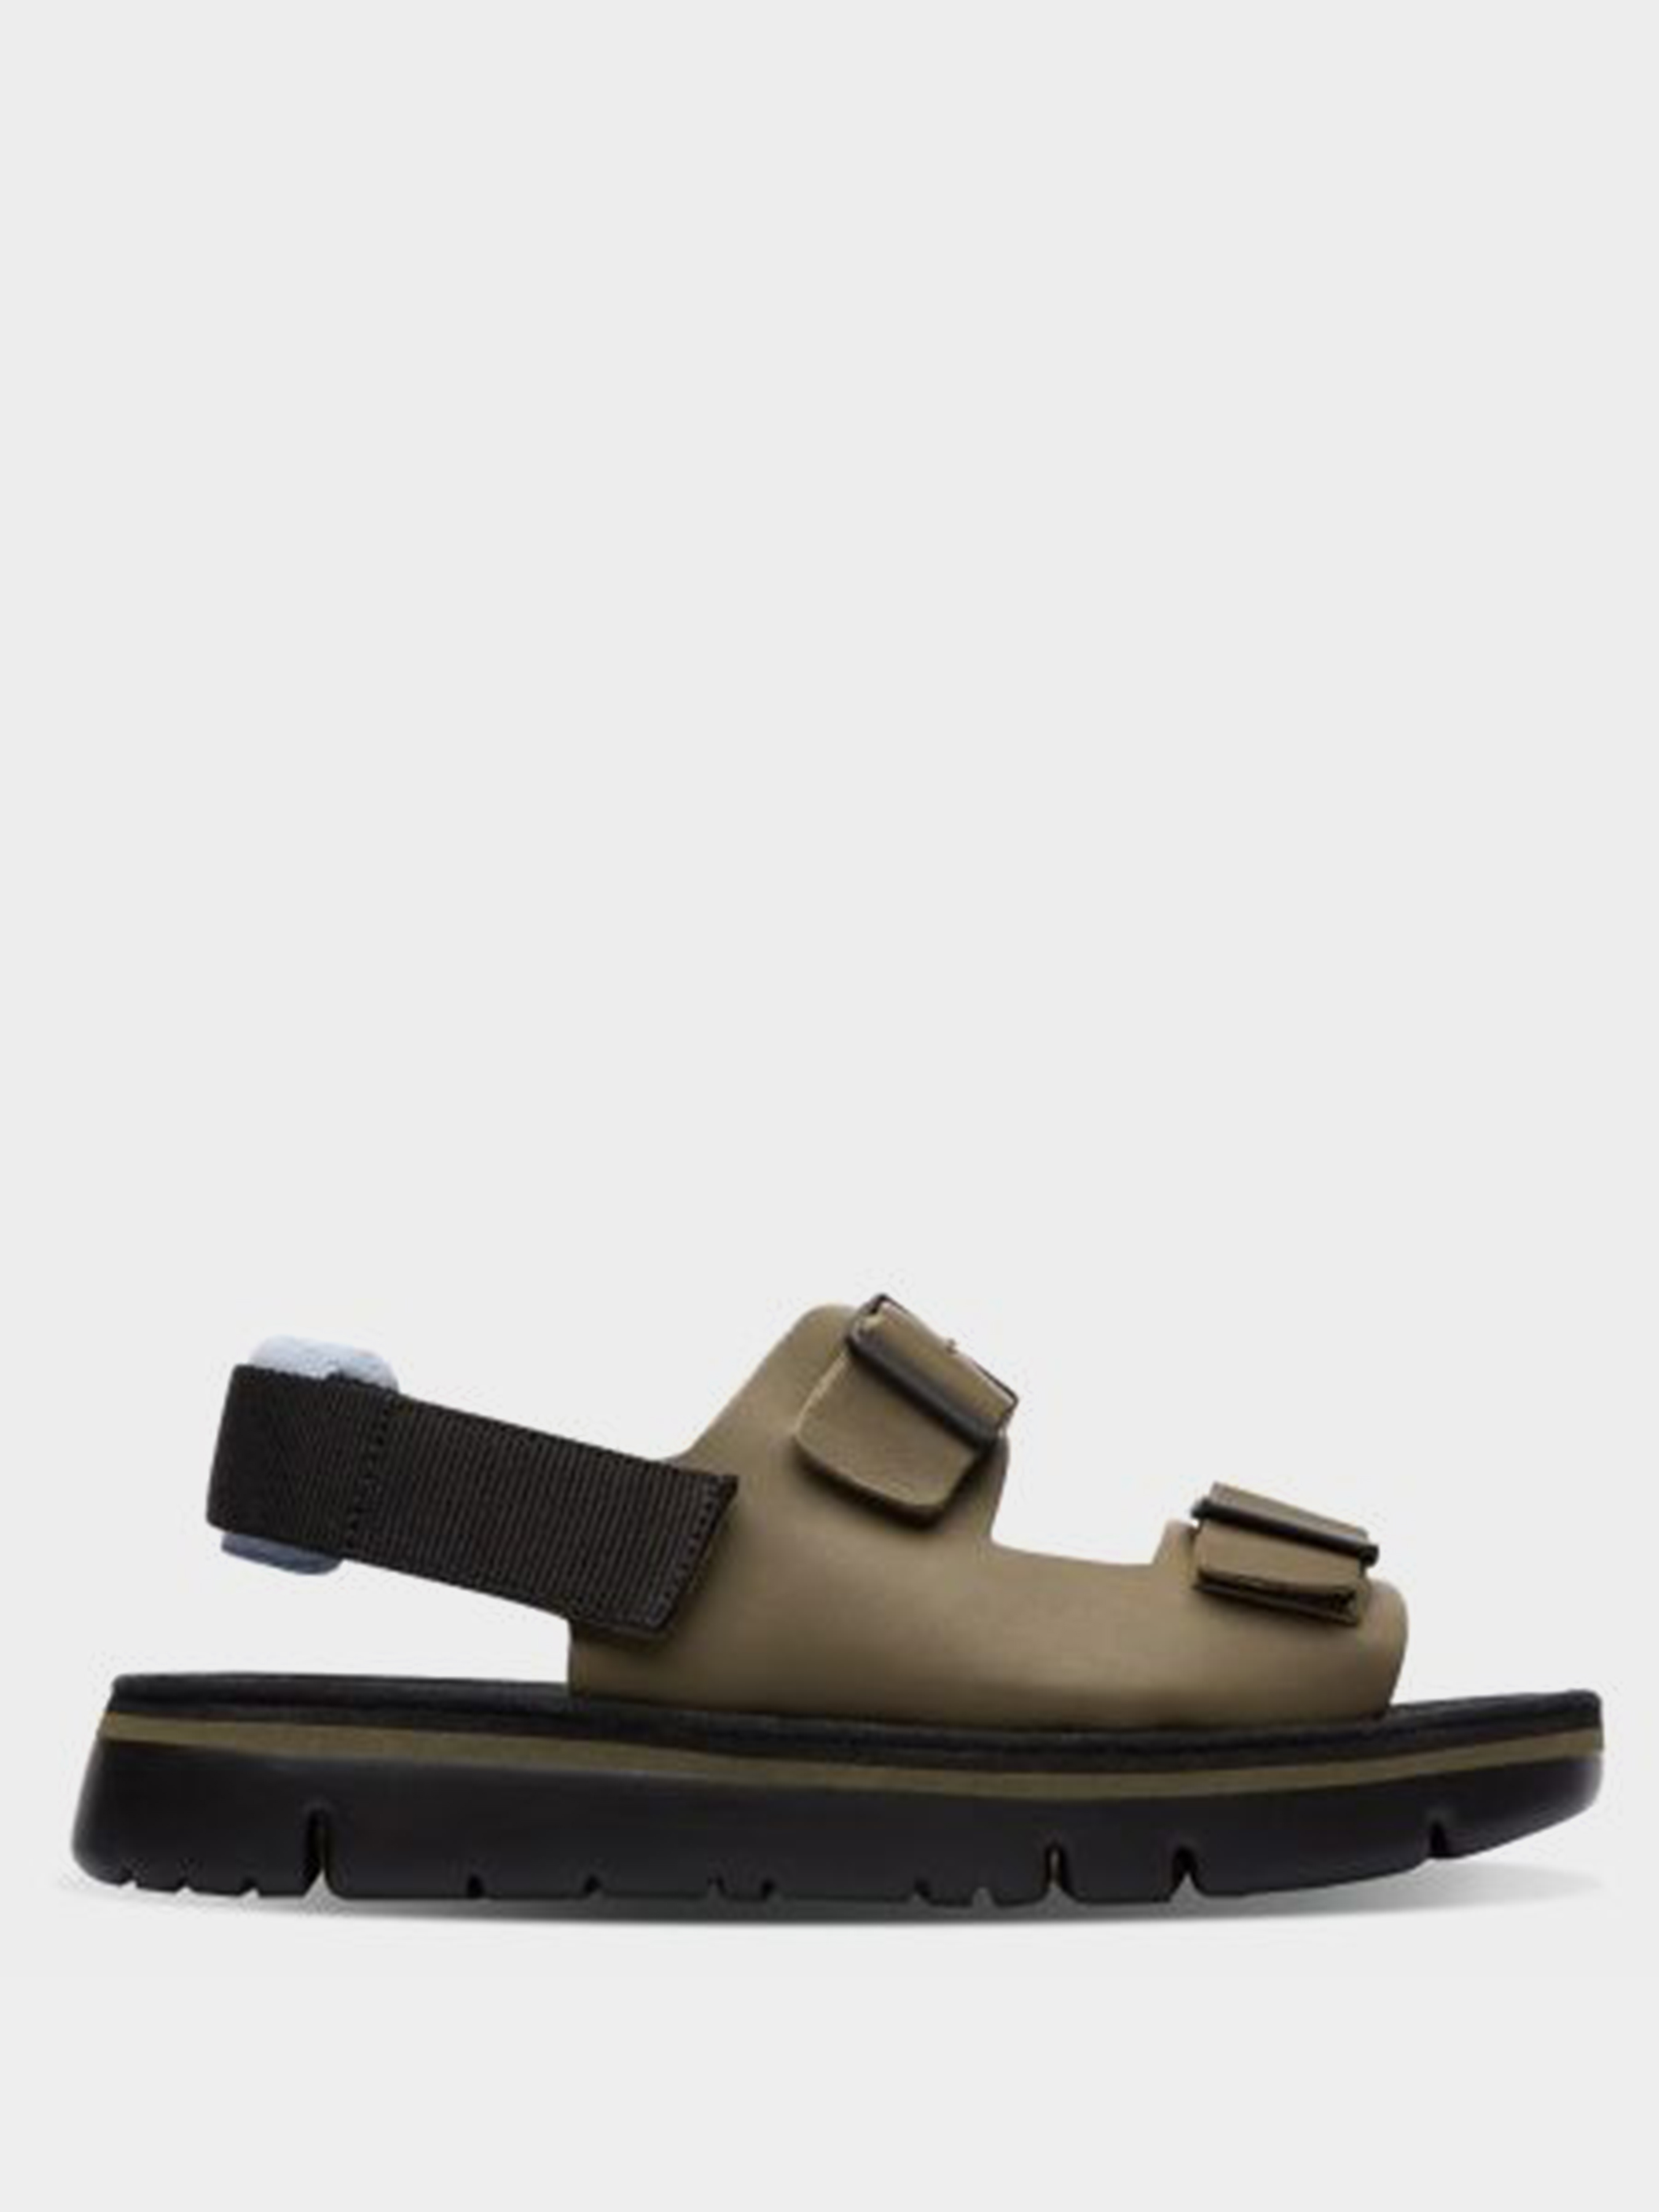 Сандалии мужские Camper Oruga Sandal AM704 размеры обуви, 2017